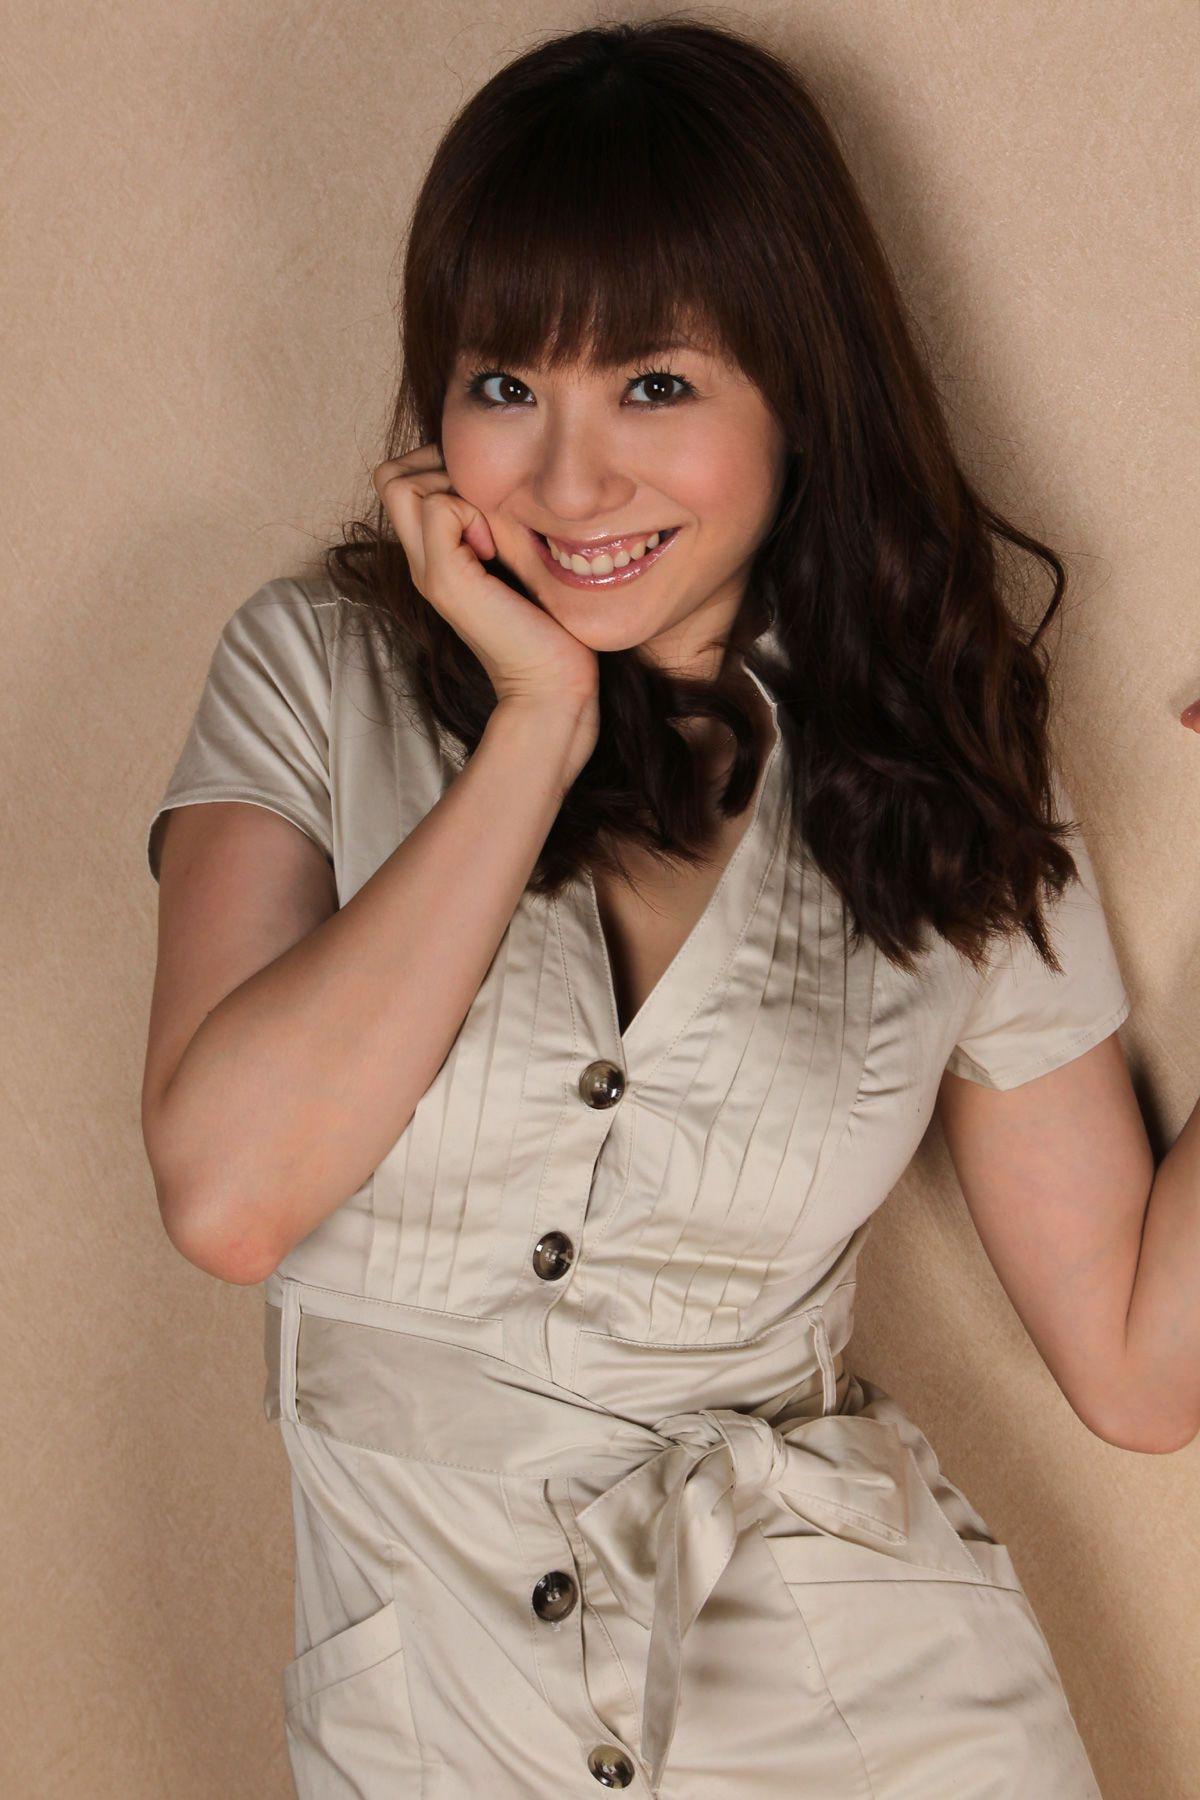 [X-City] KIMONO和テイスト 019 麻美ゆま Yuma Asami 寫真集(20) -美女寫真 ...